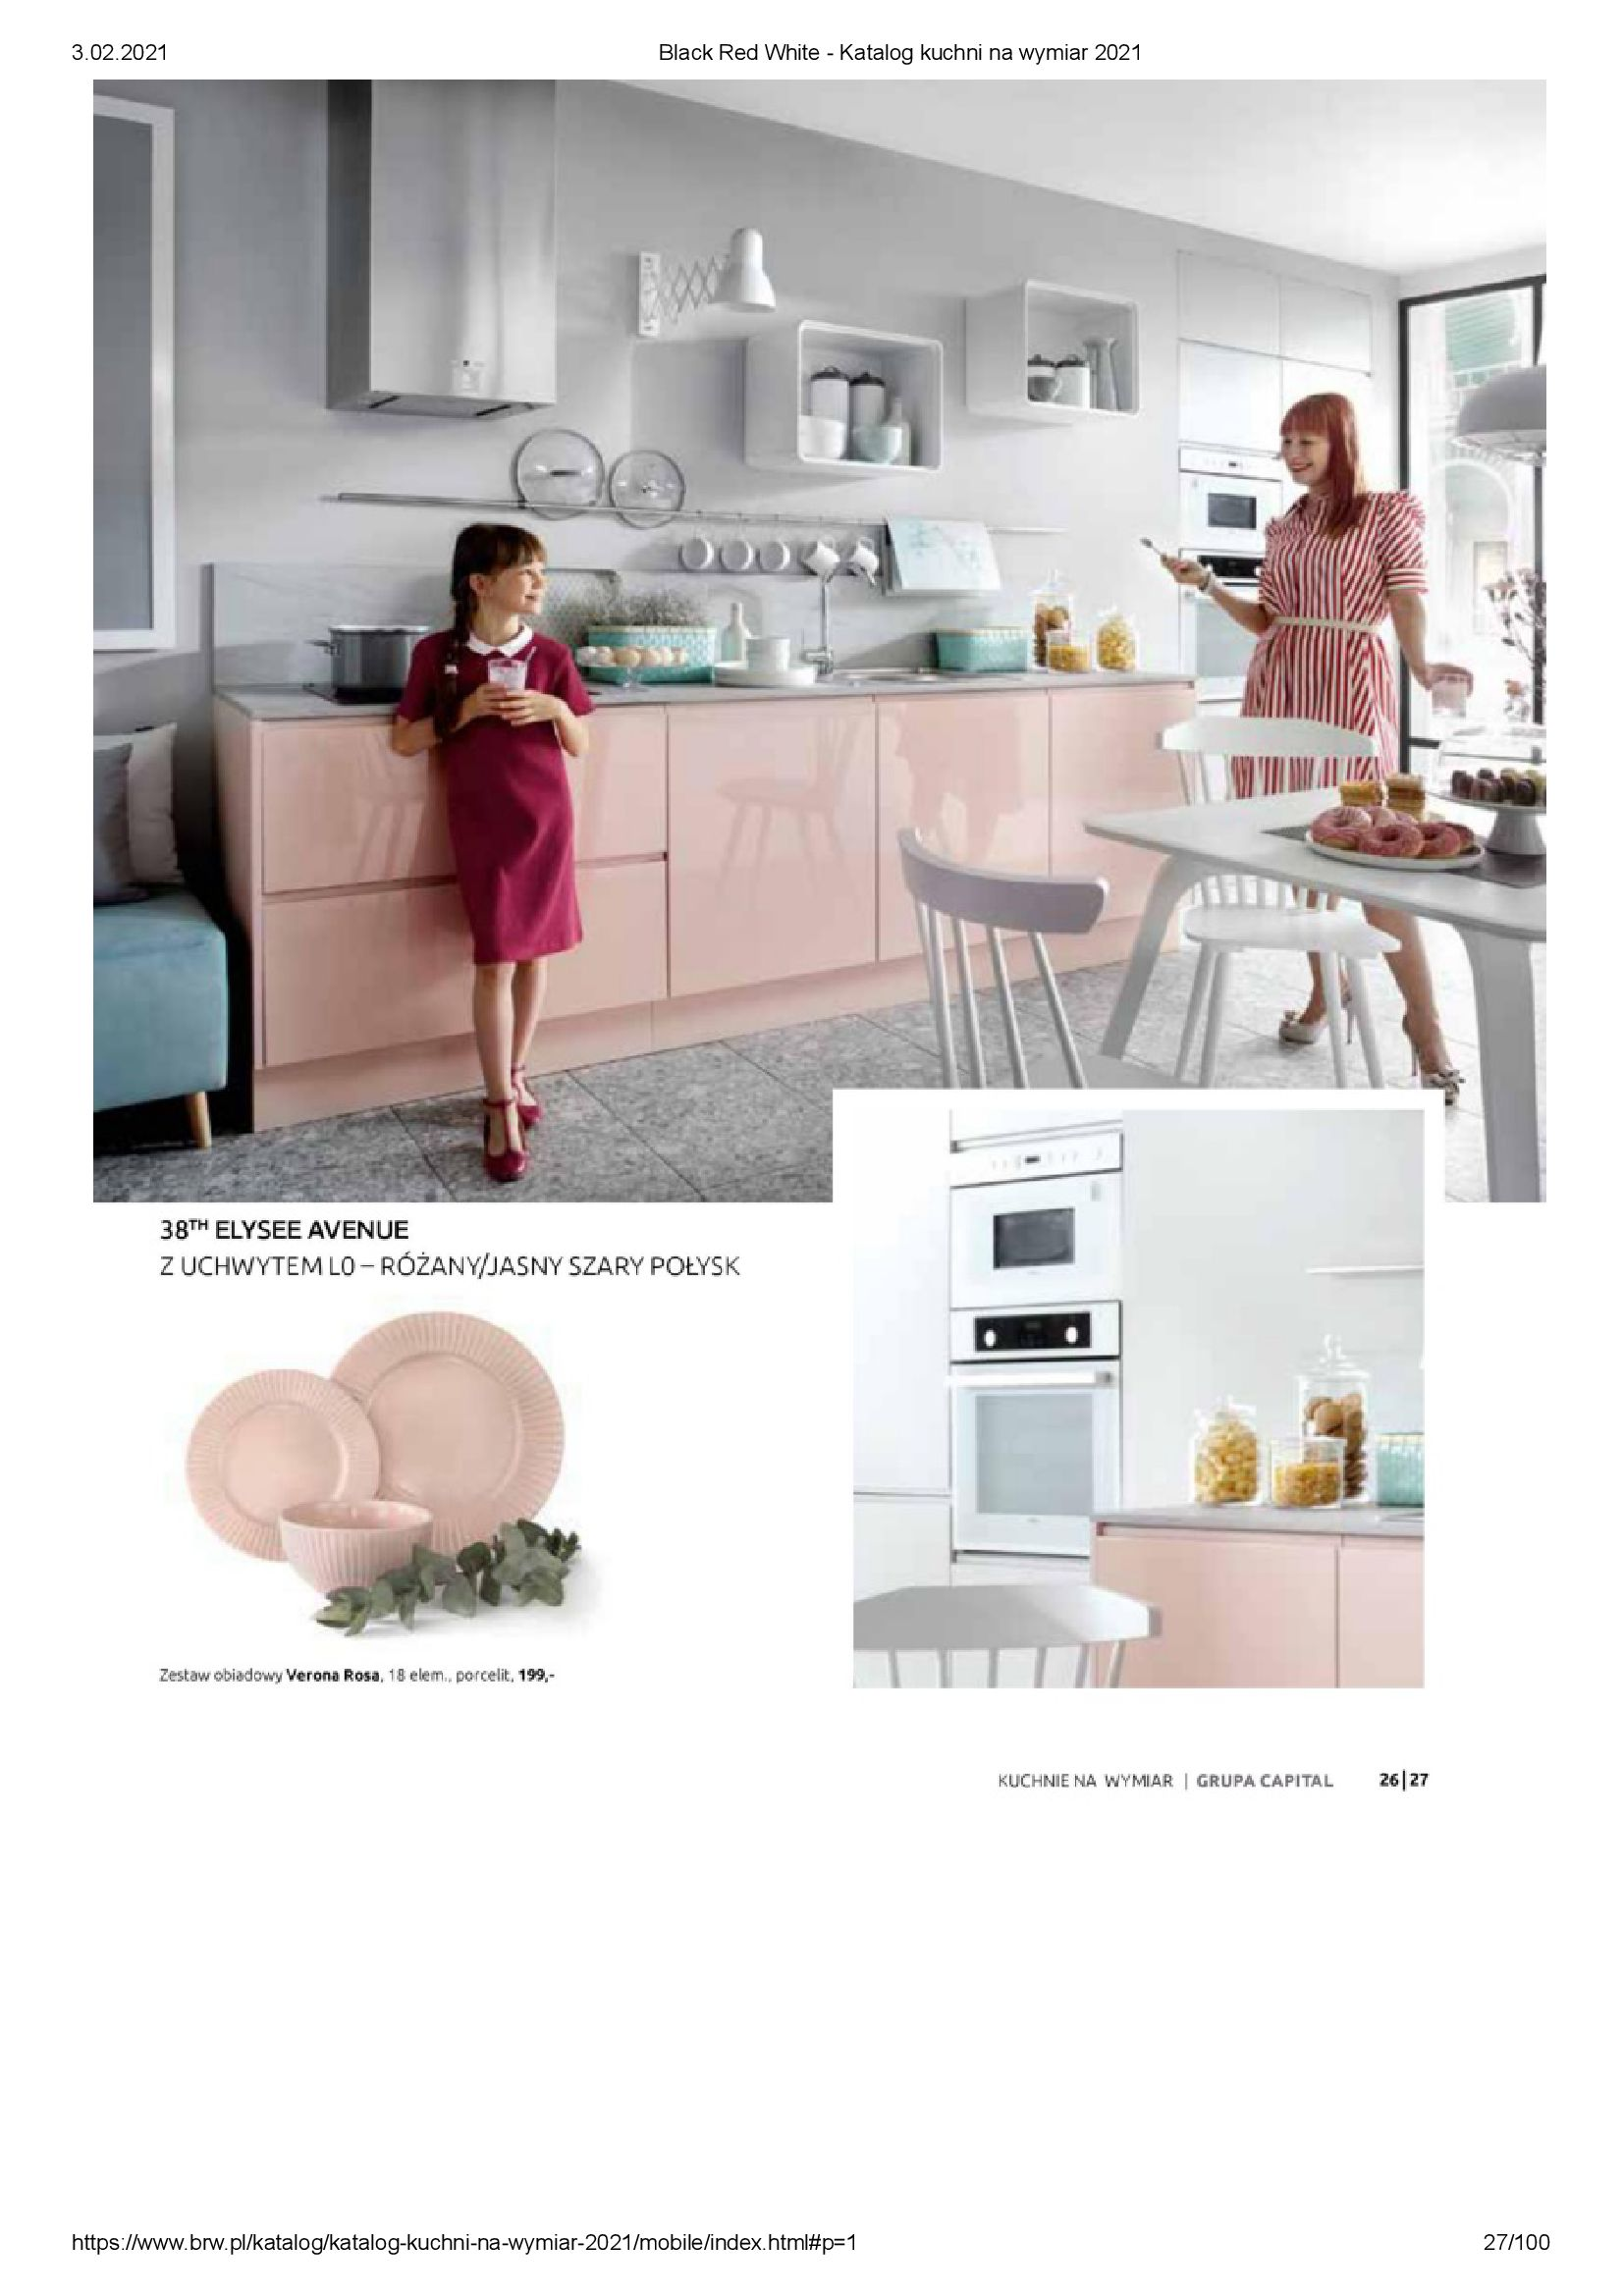 Gazetka Black Red White: Katalog - Kuchnie na wymiar Senso Kitchens 2021 2021-01-01 page-27